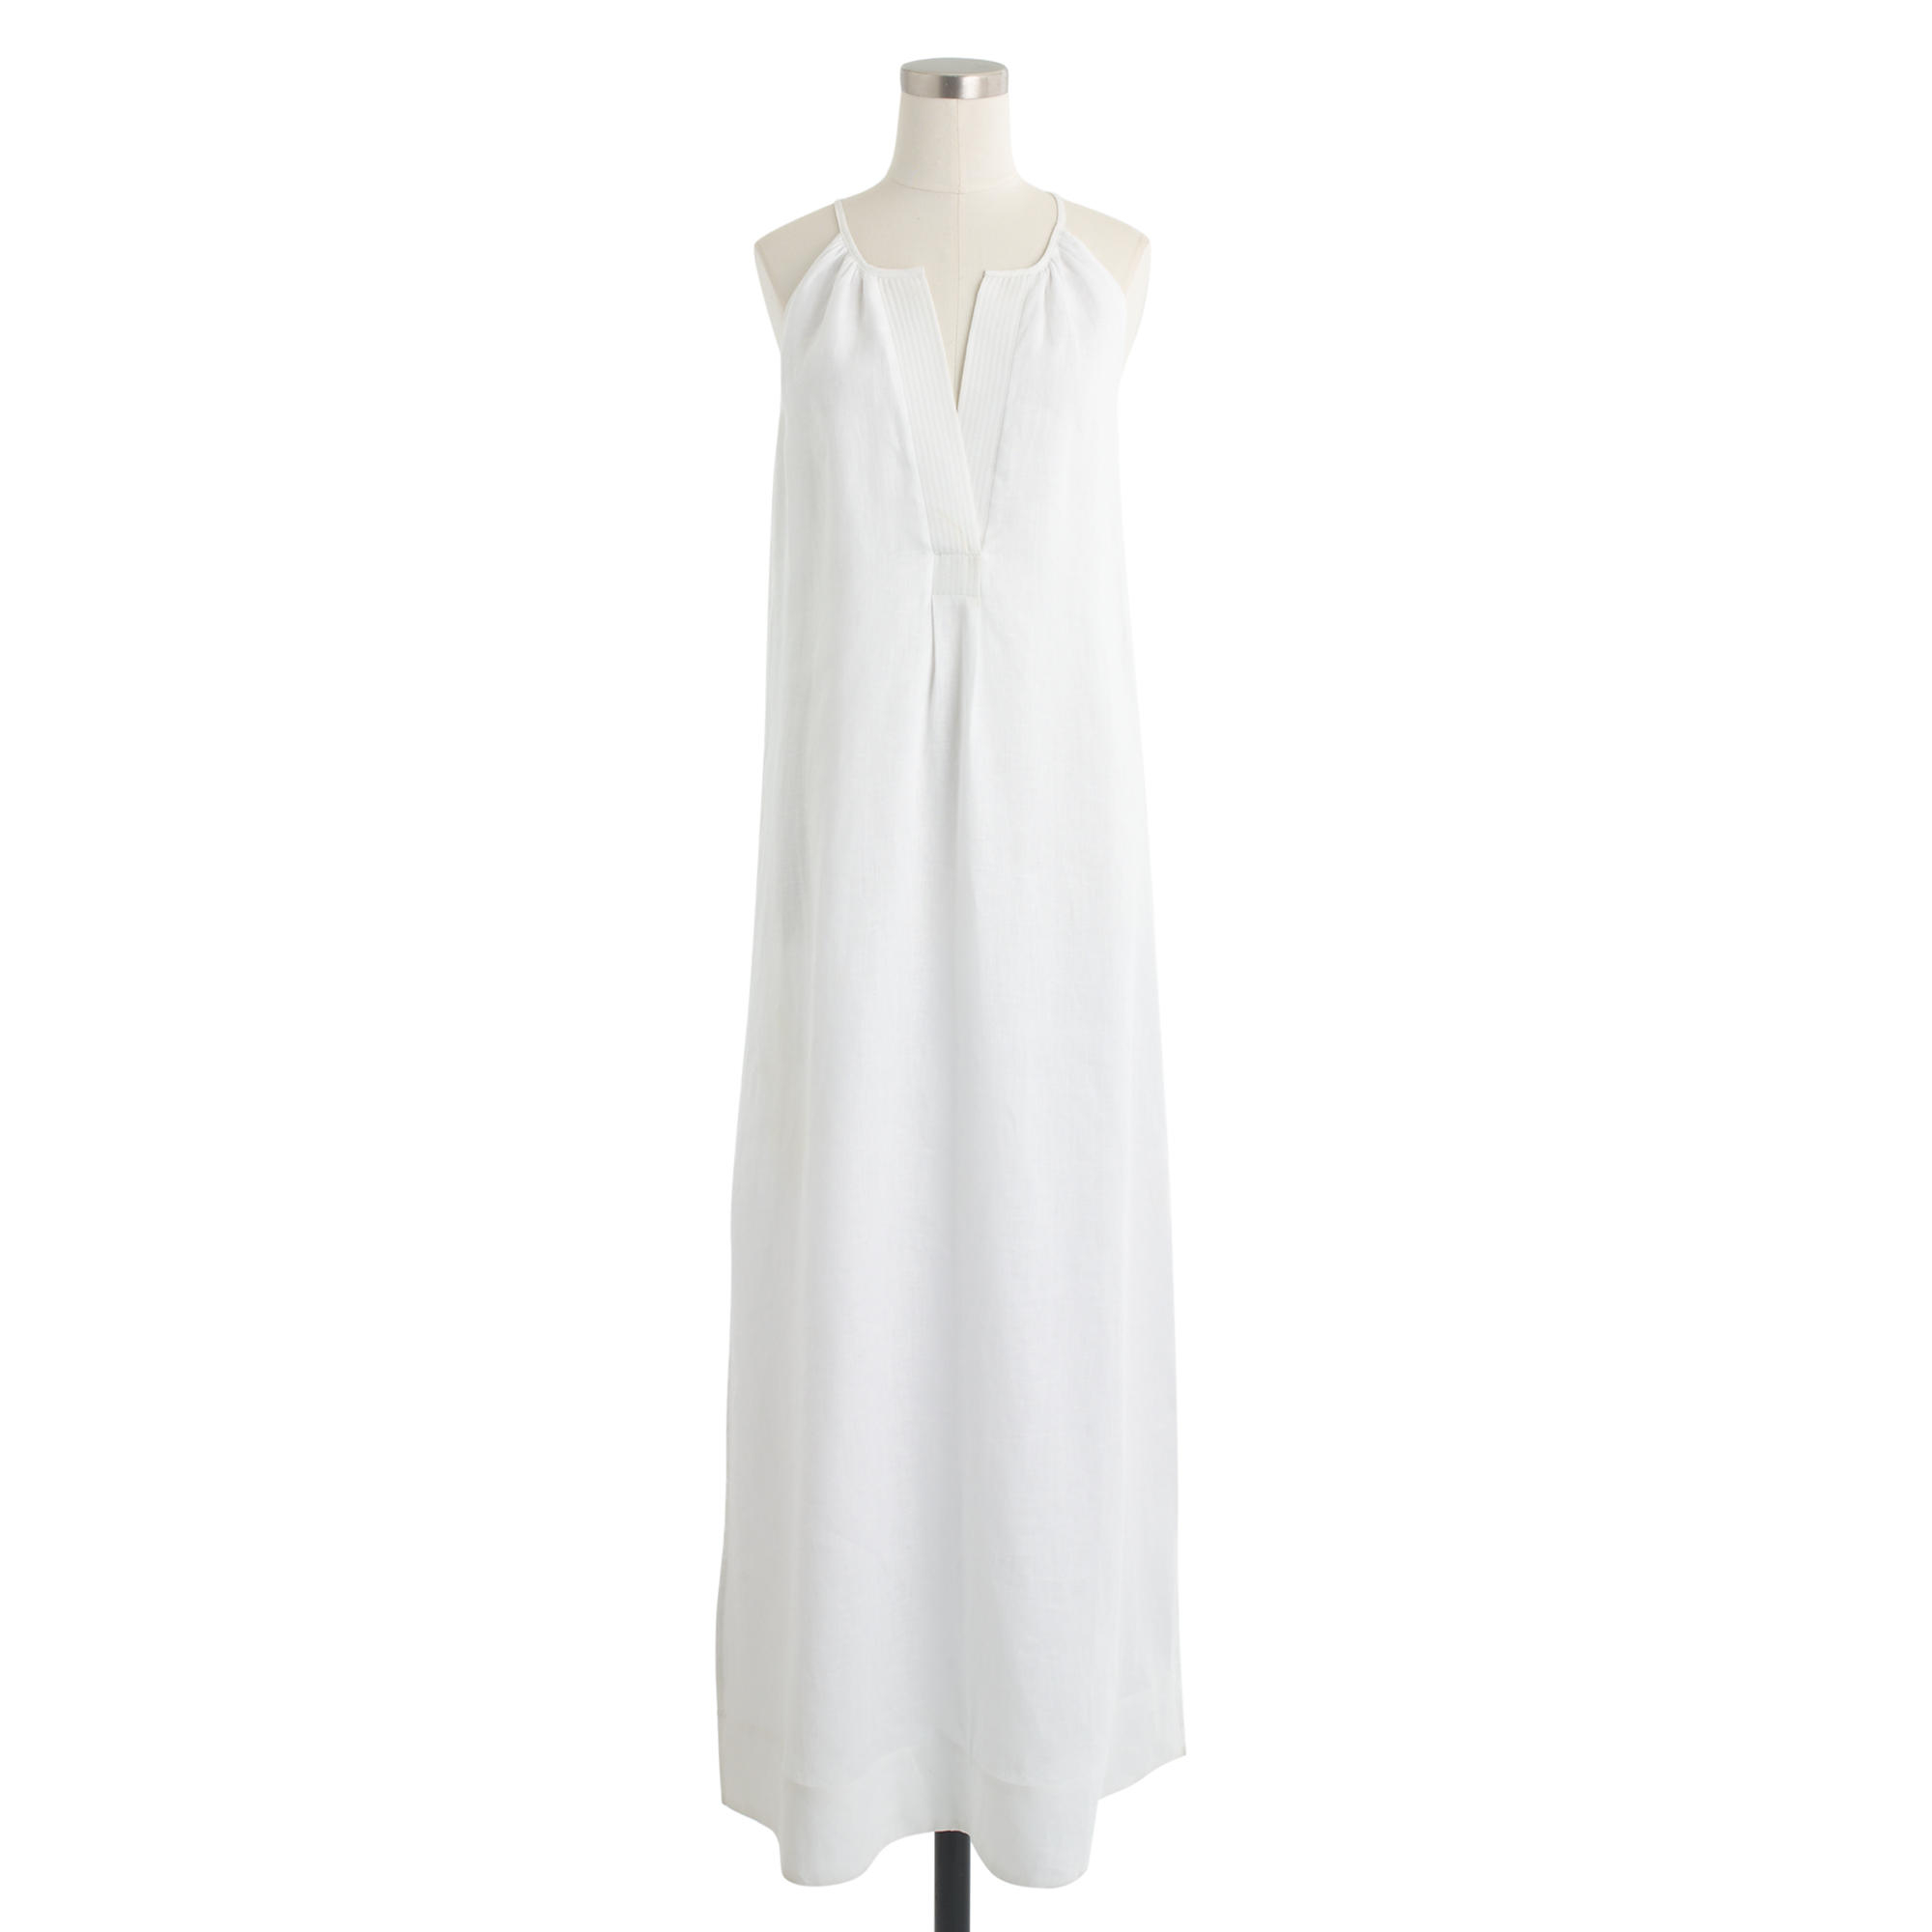 b4c28769e7a Gallery. Women s White Linen Dresses Women s Long ...